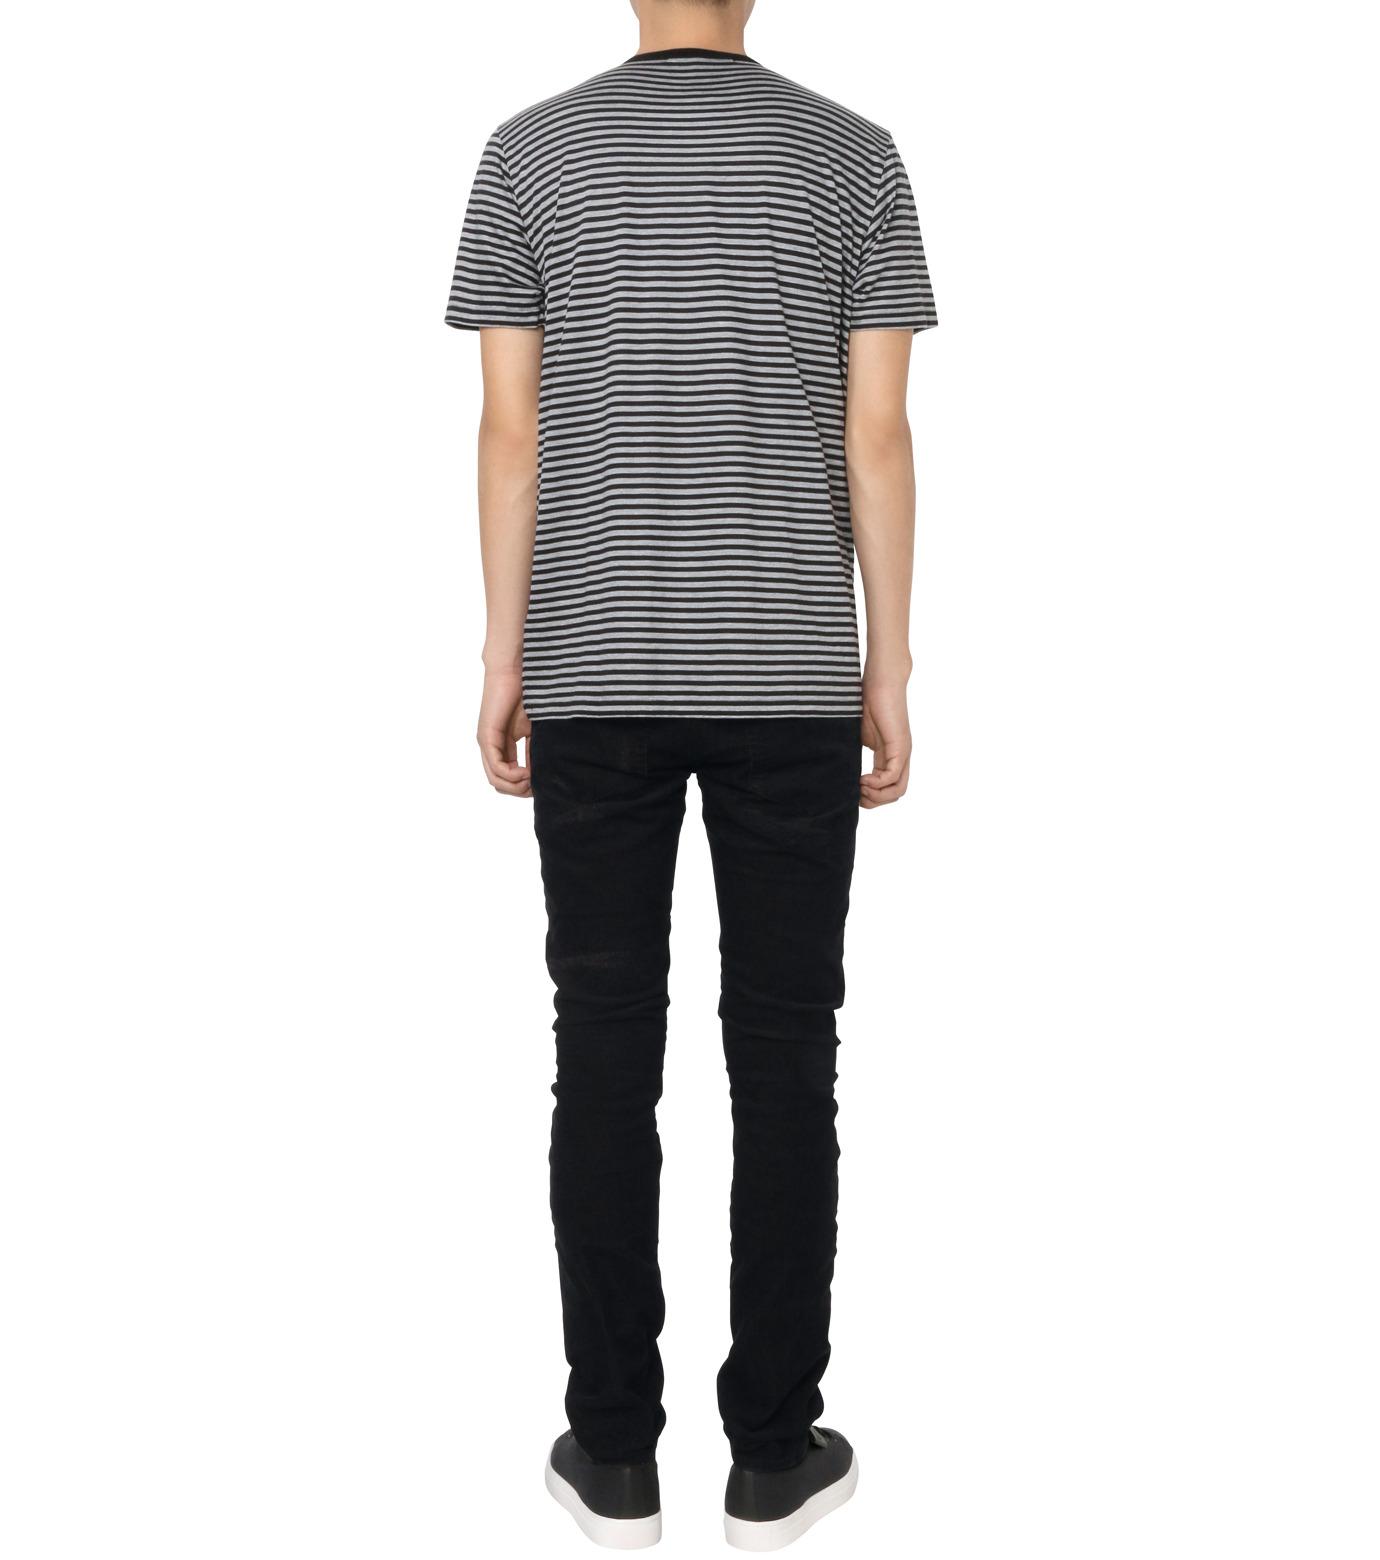 HL HEDDIE LOVU(エイチエル・エディールーヴ)のBLACK CORDUROY DAMAGE PANTS-BLACK(パンツ/pants)-18A98001-13 拡大詳細画像3